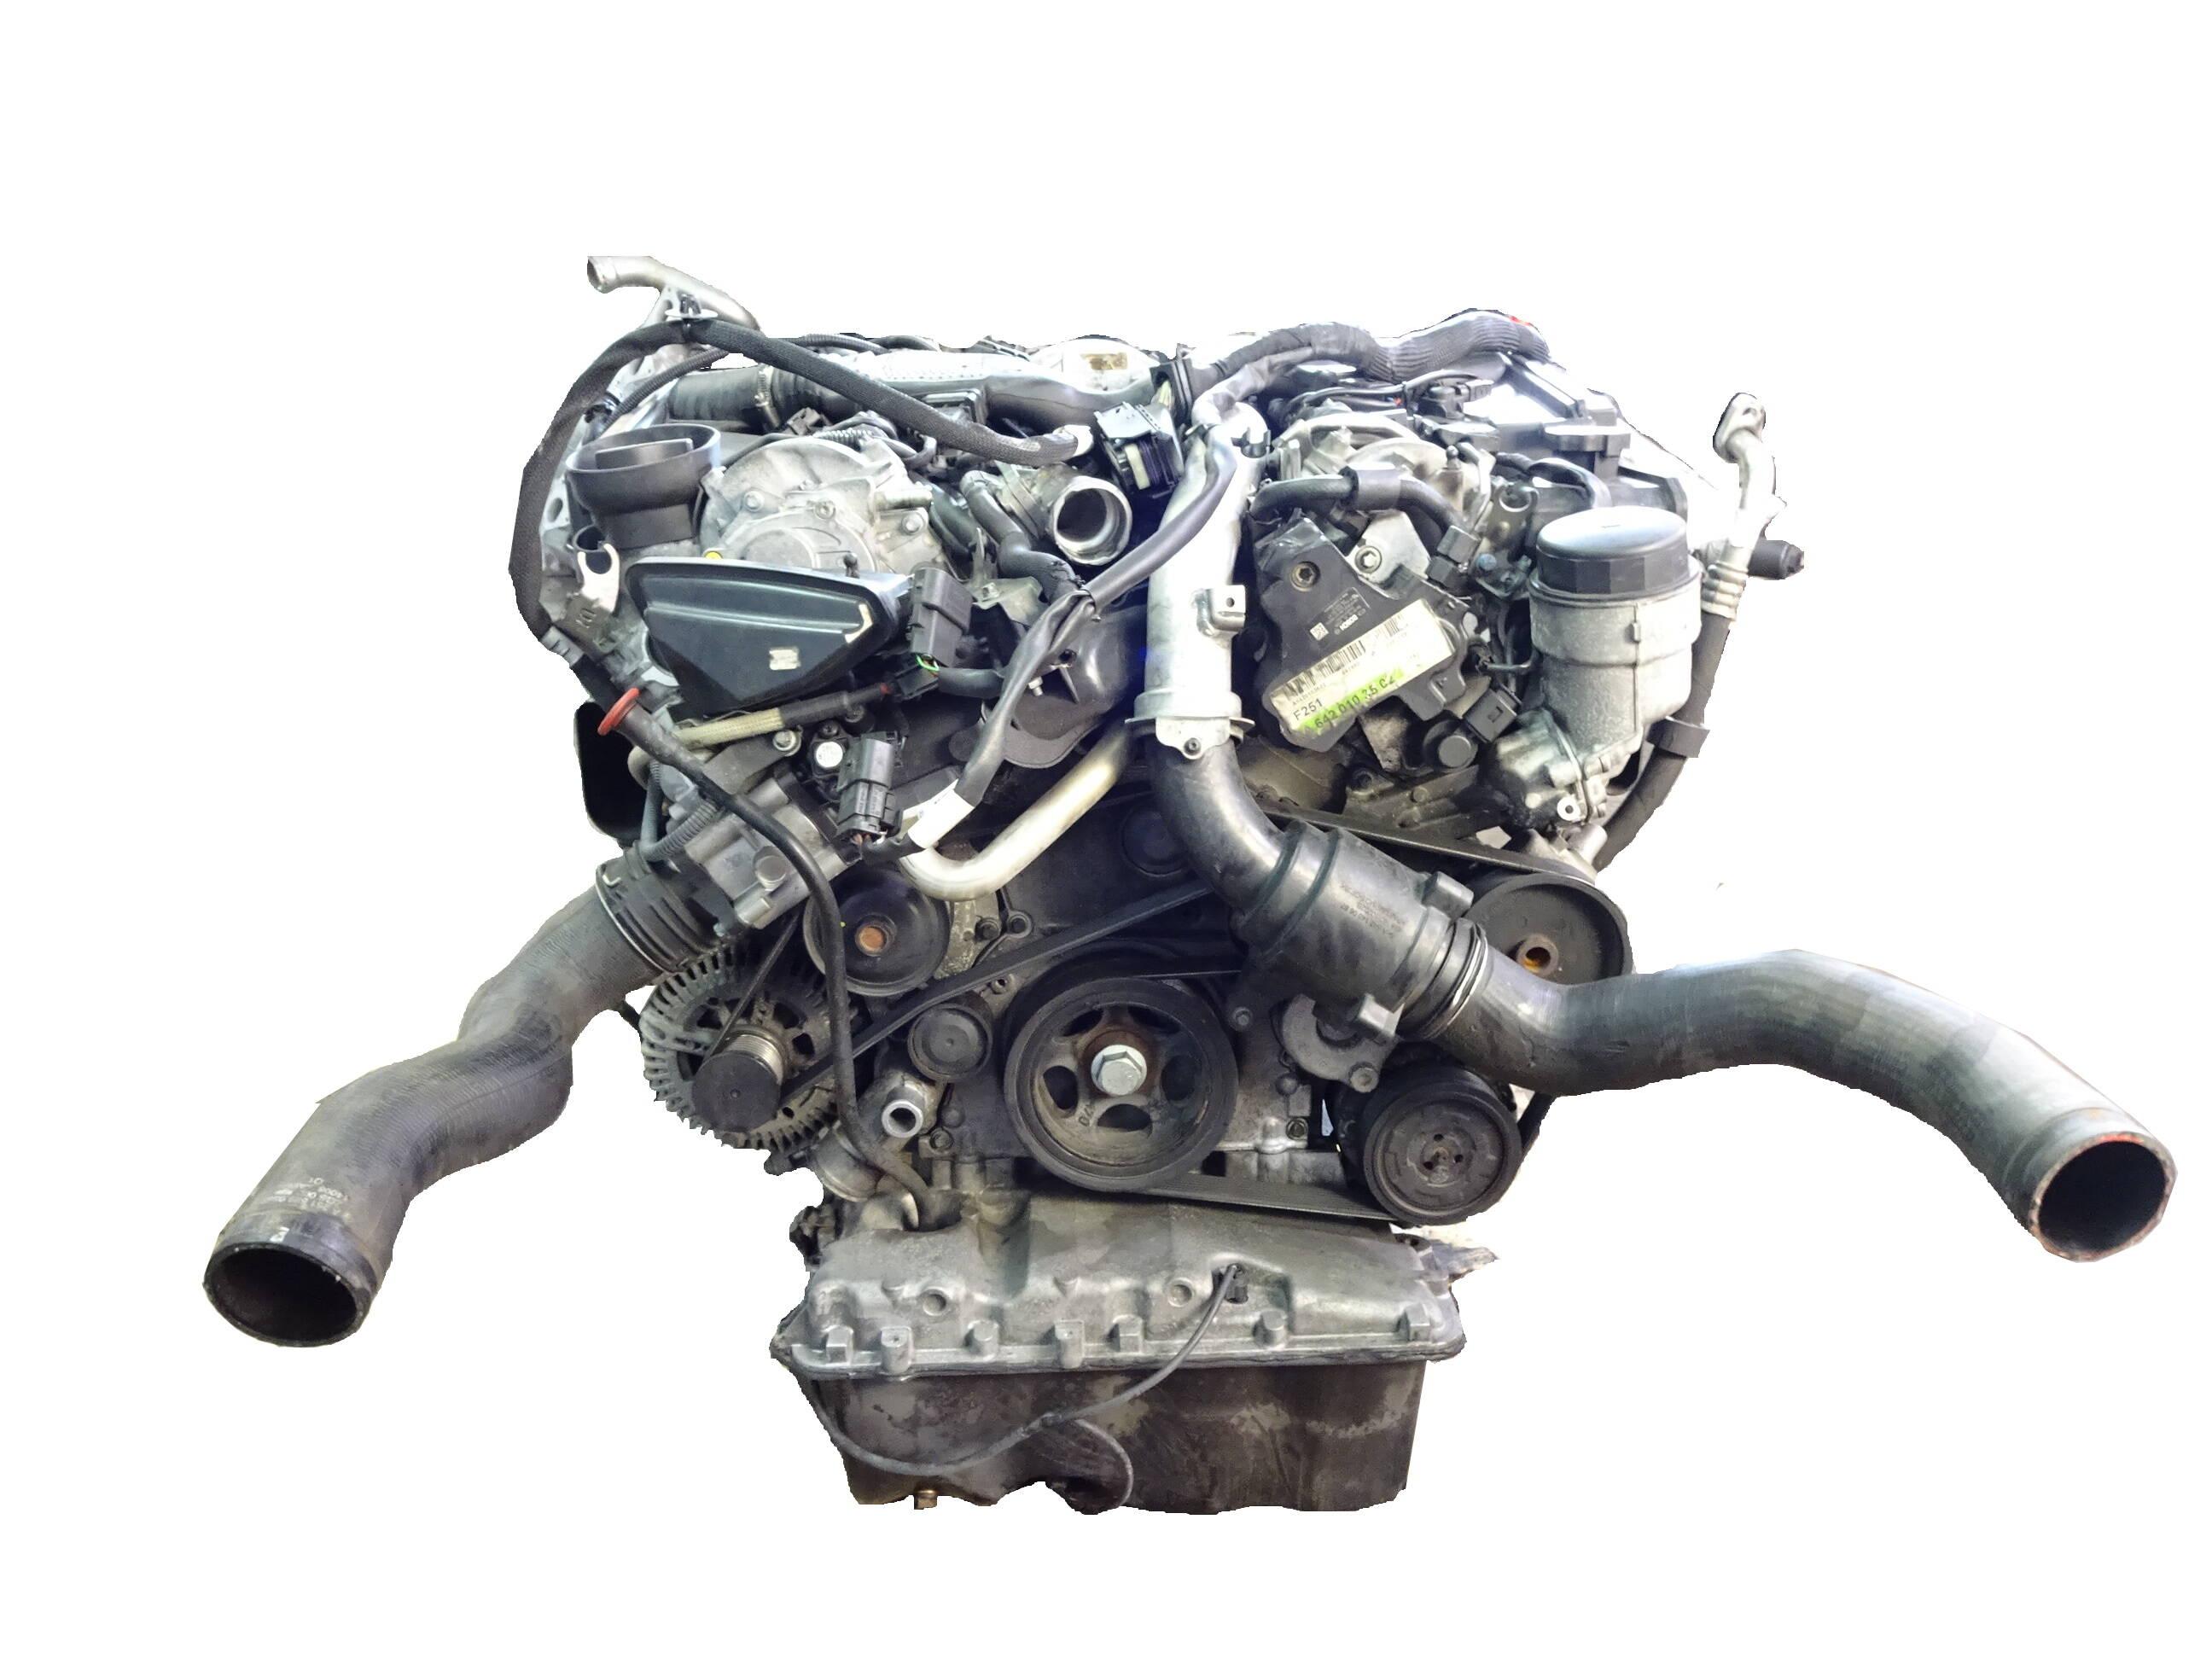 Motor 2007 Mercedes Benz R-Klasse W251 V251 3,0 CDI Diesel 642.950 OM642